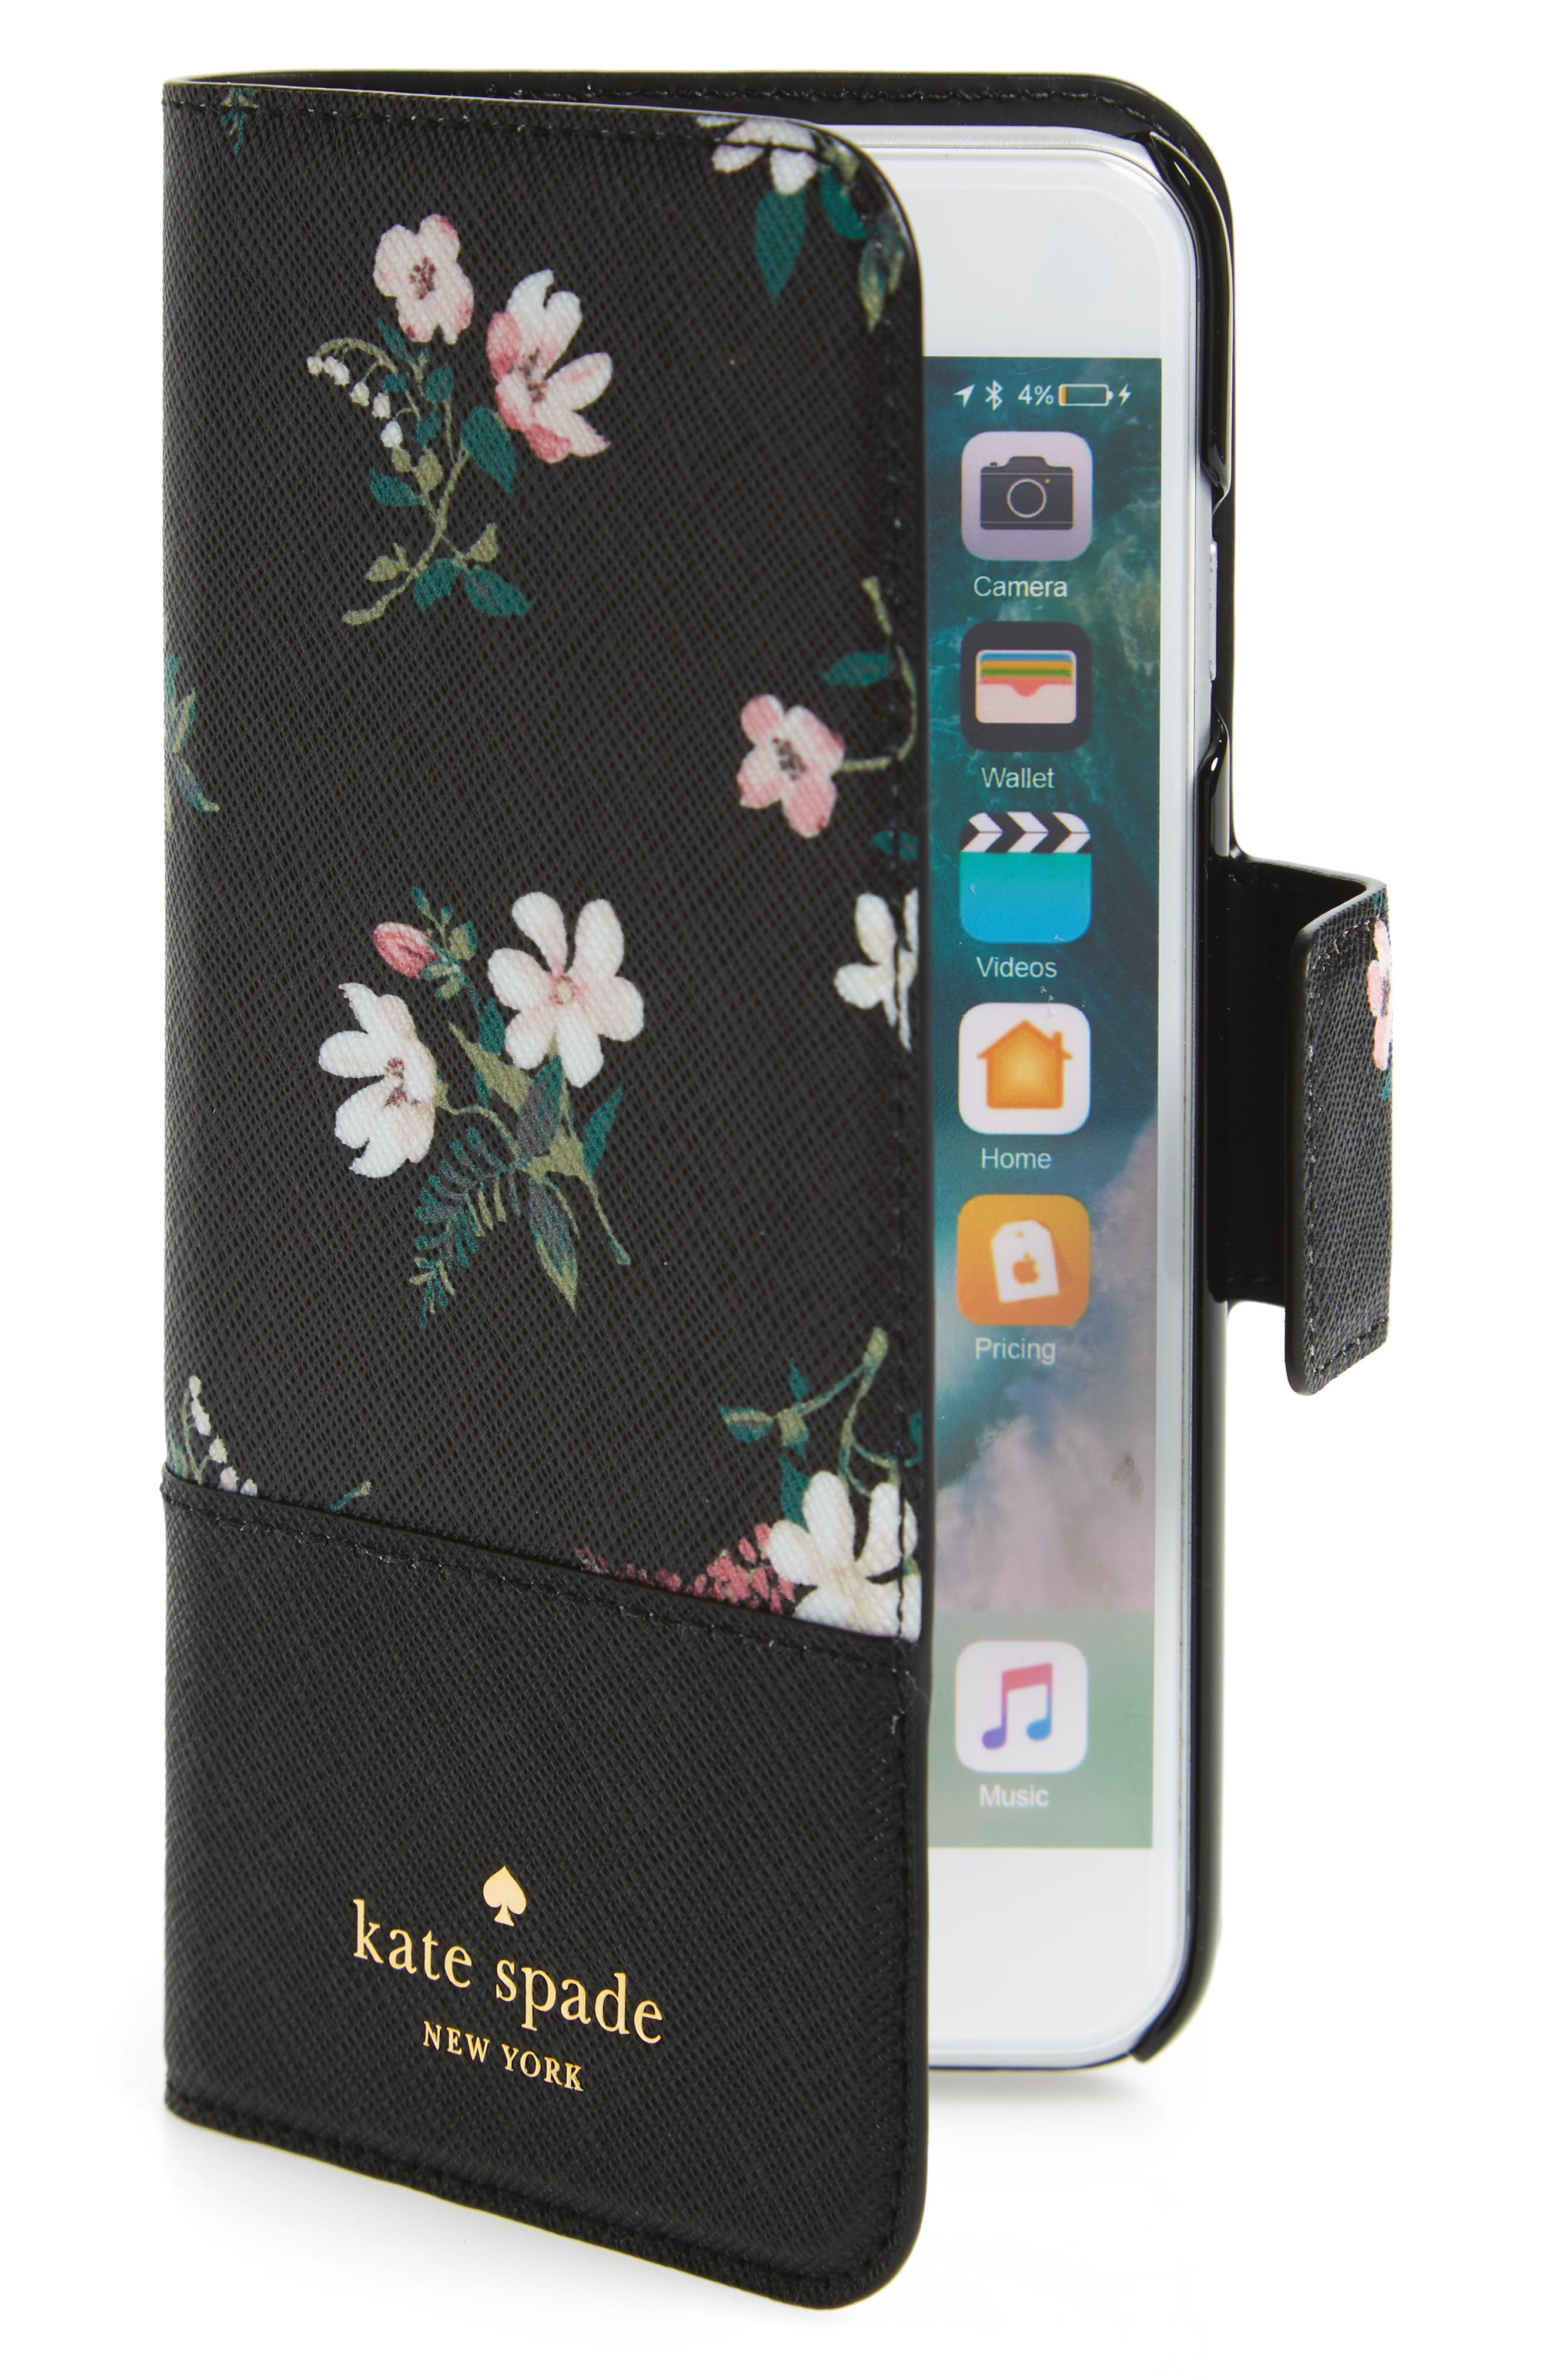 kate spade new york cedar street faux leather iPhone 7/8 & 7/8 Plus folio case